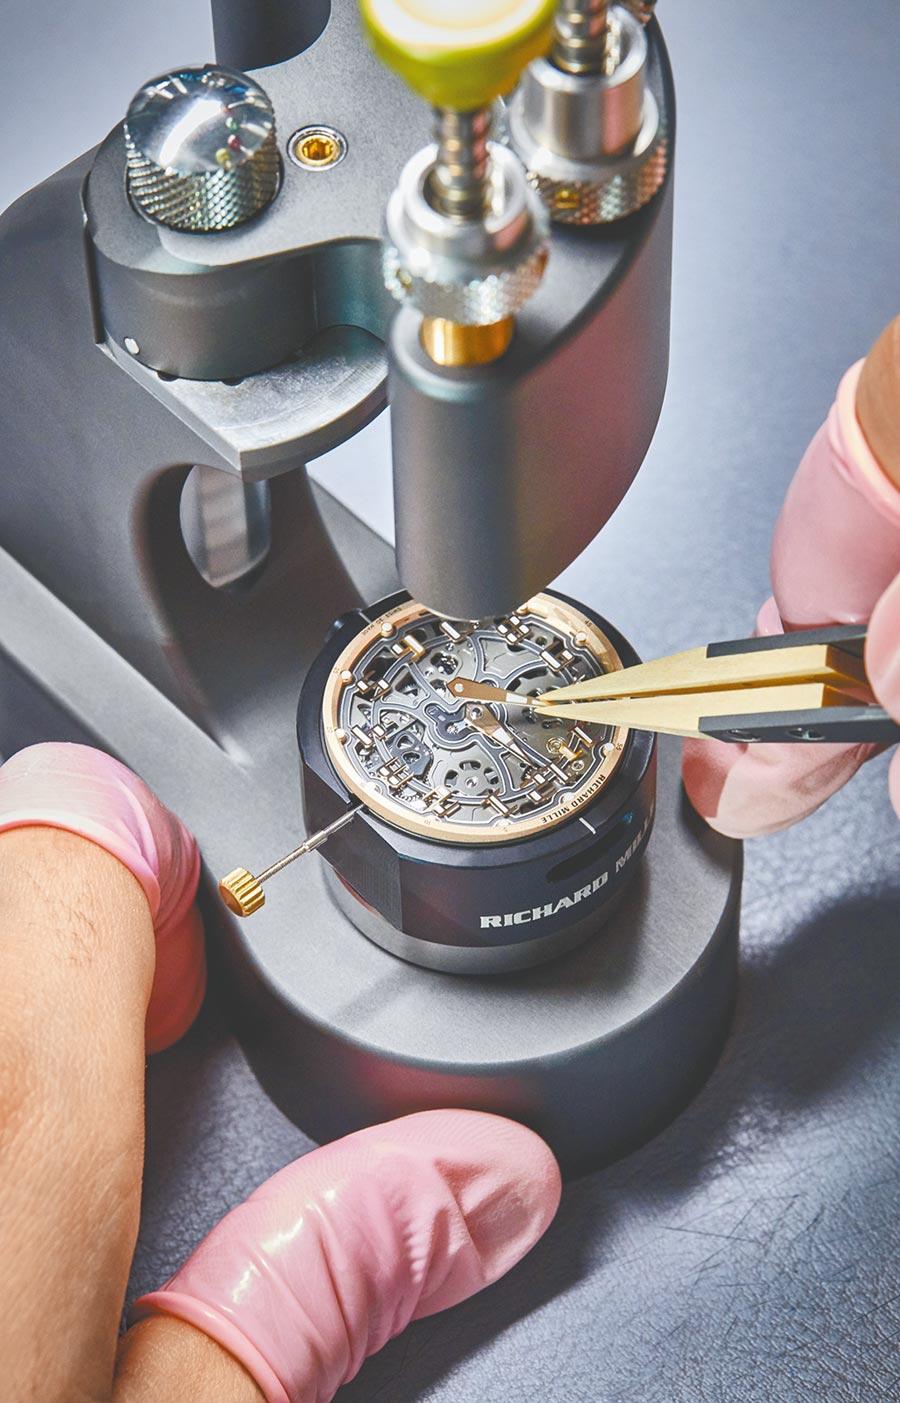 RM33-02腕表採用RMXP1超薄機芯,充分展現品牌精湛的製表工藝。(RICHARD MILLE提供)